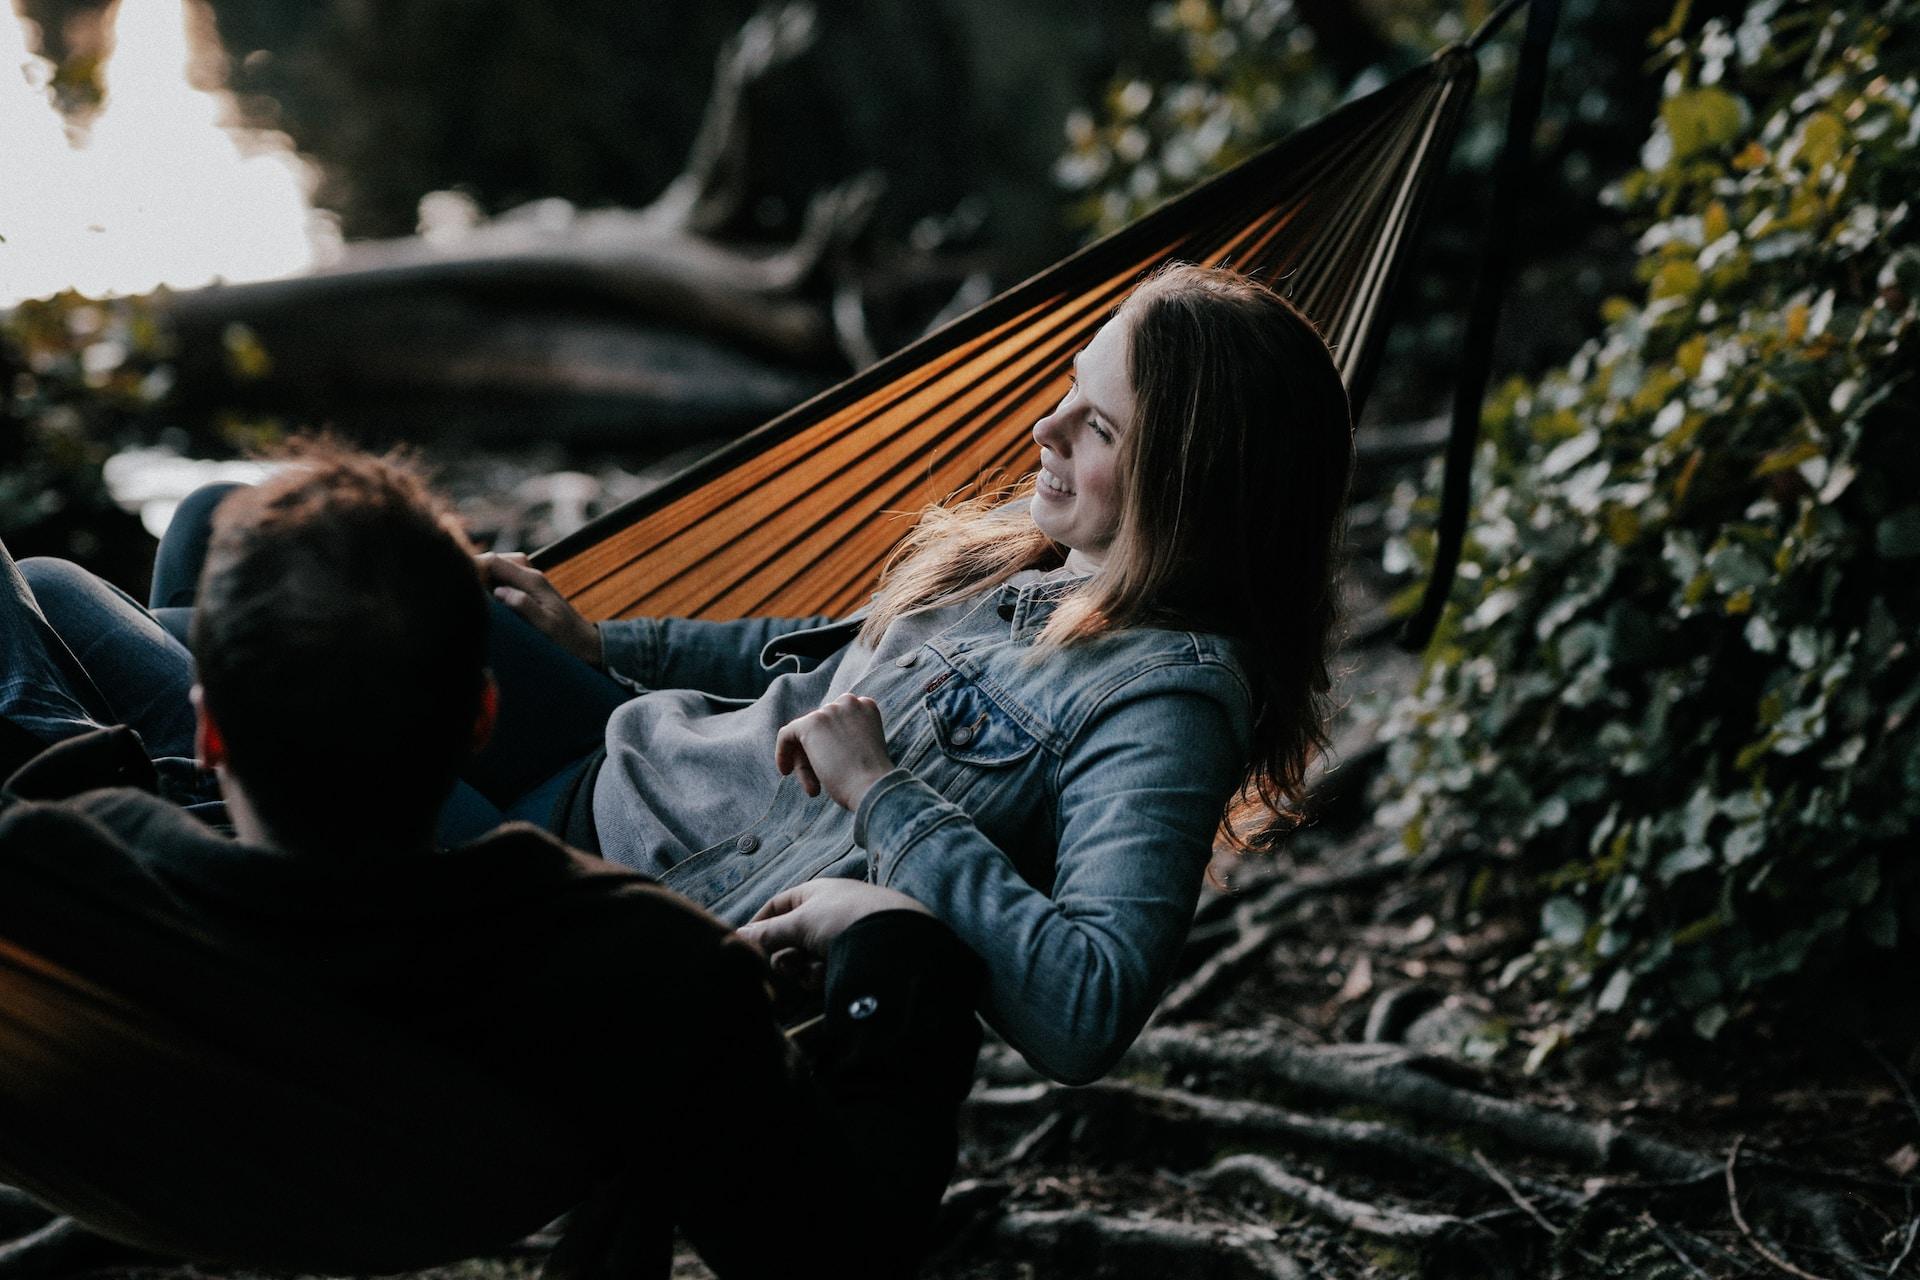 man and woman lying on hammock